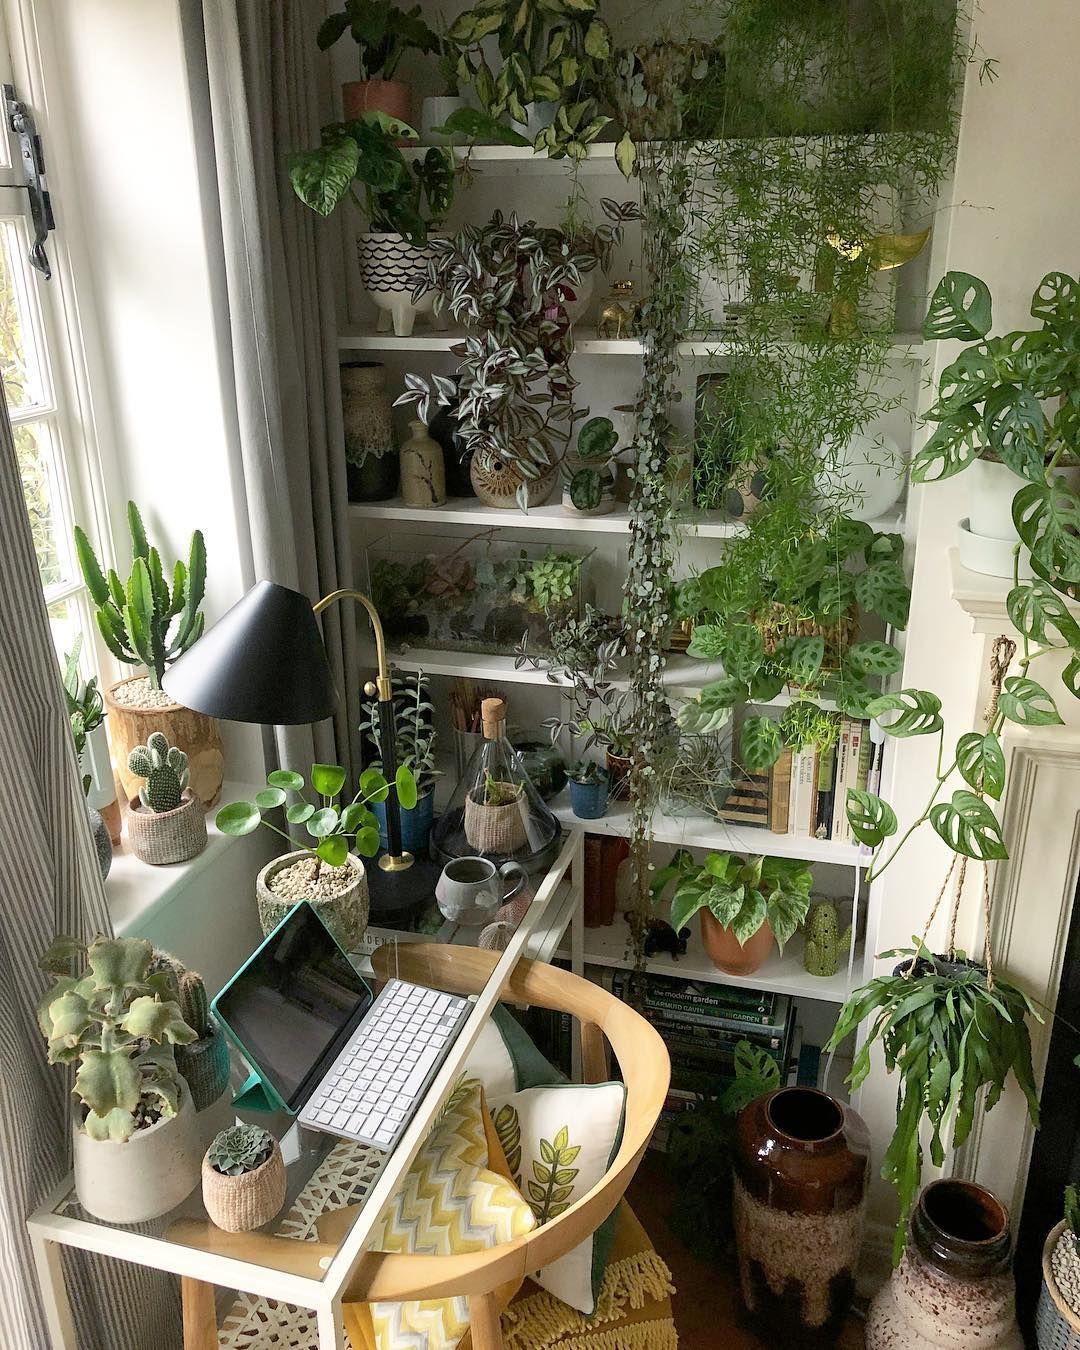 Plants Inside Rooms: Welcome To The Urban Jungle #houseplants #plantsdecor